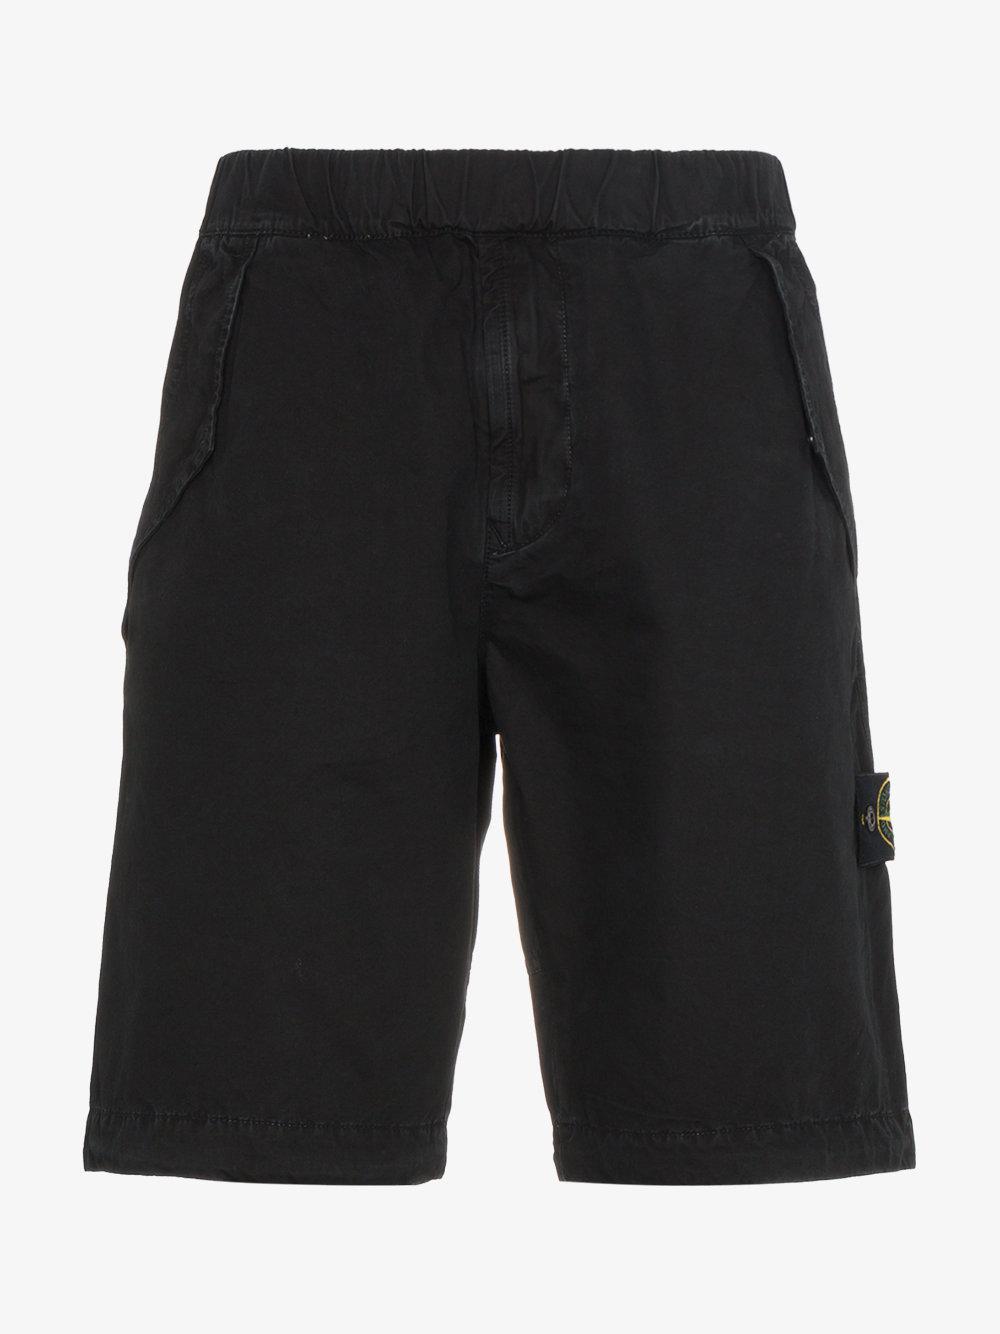 lyst stone island logo cargo shorts in black for men. Black Bedroom Furniture Sets. Home Design Ideas